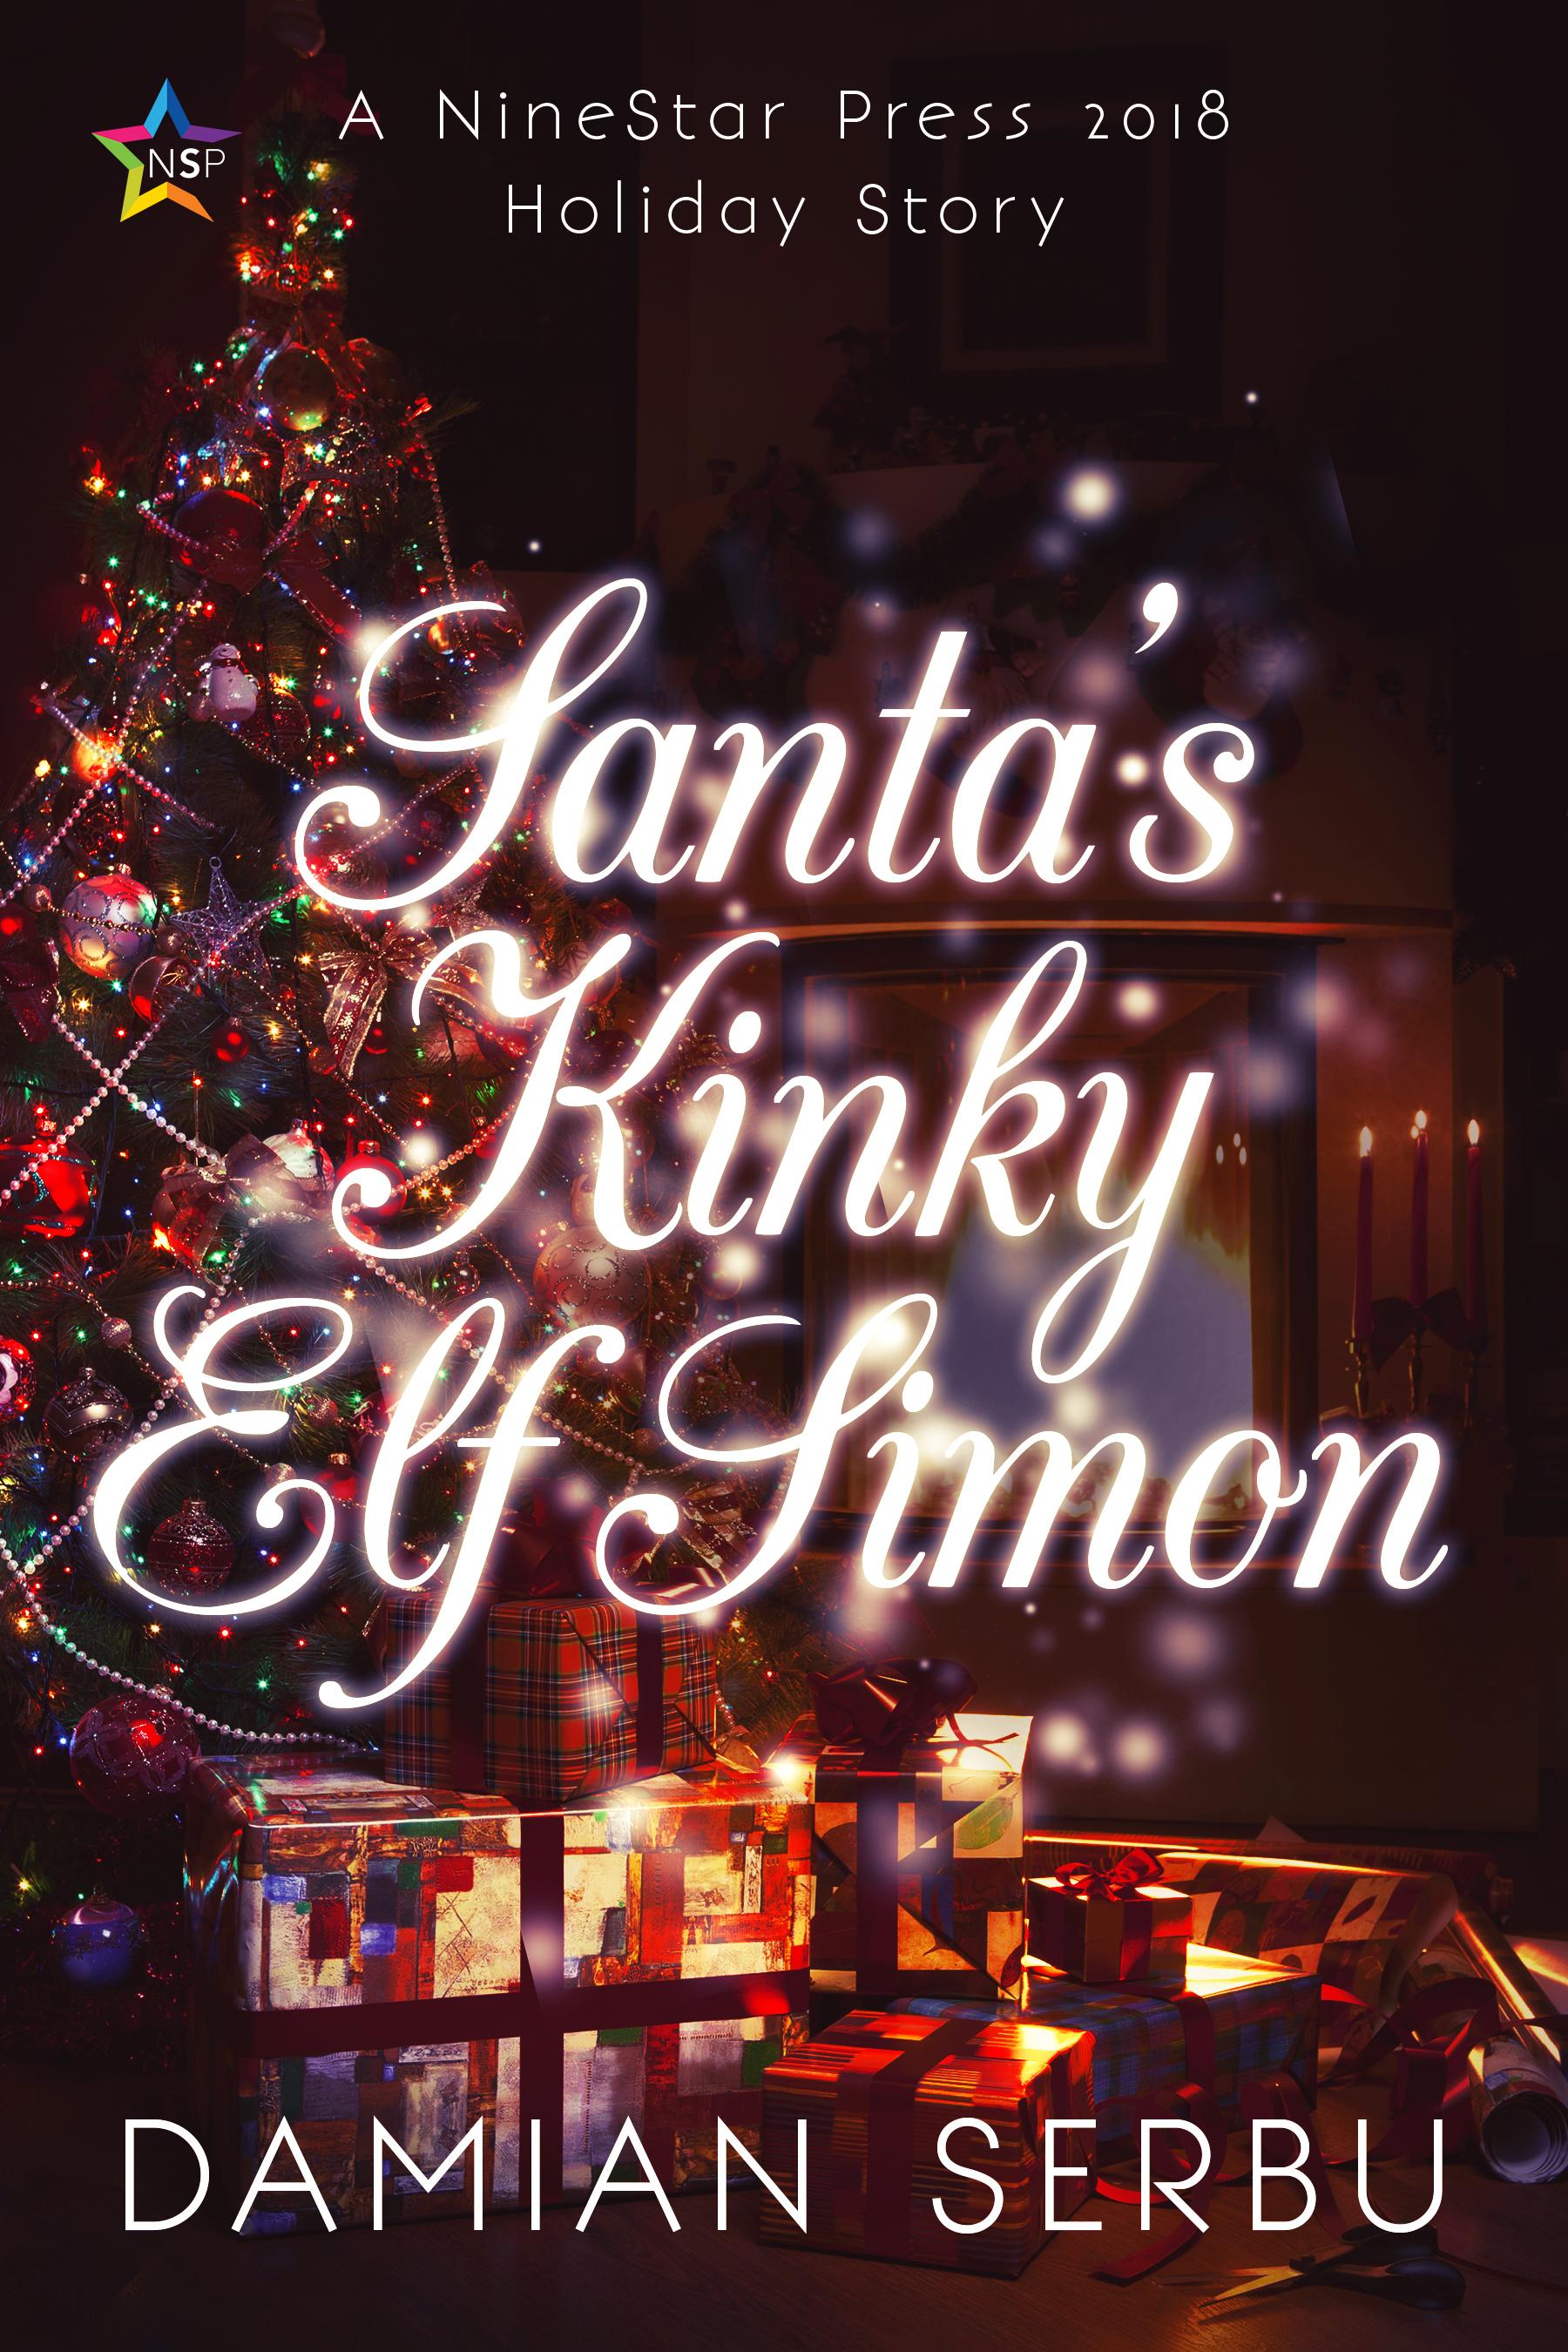 Holiday2018Cover-SantasKinkyElfSimon.jpg